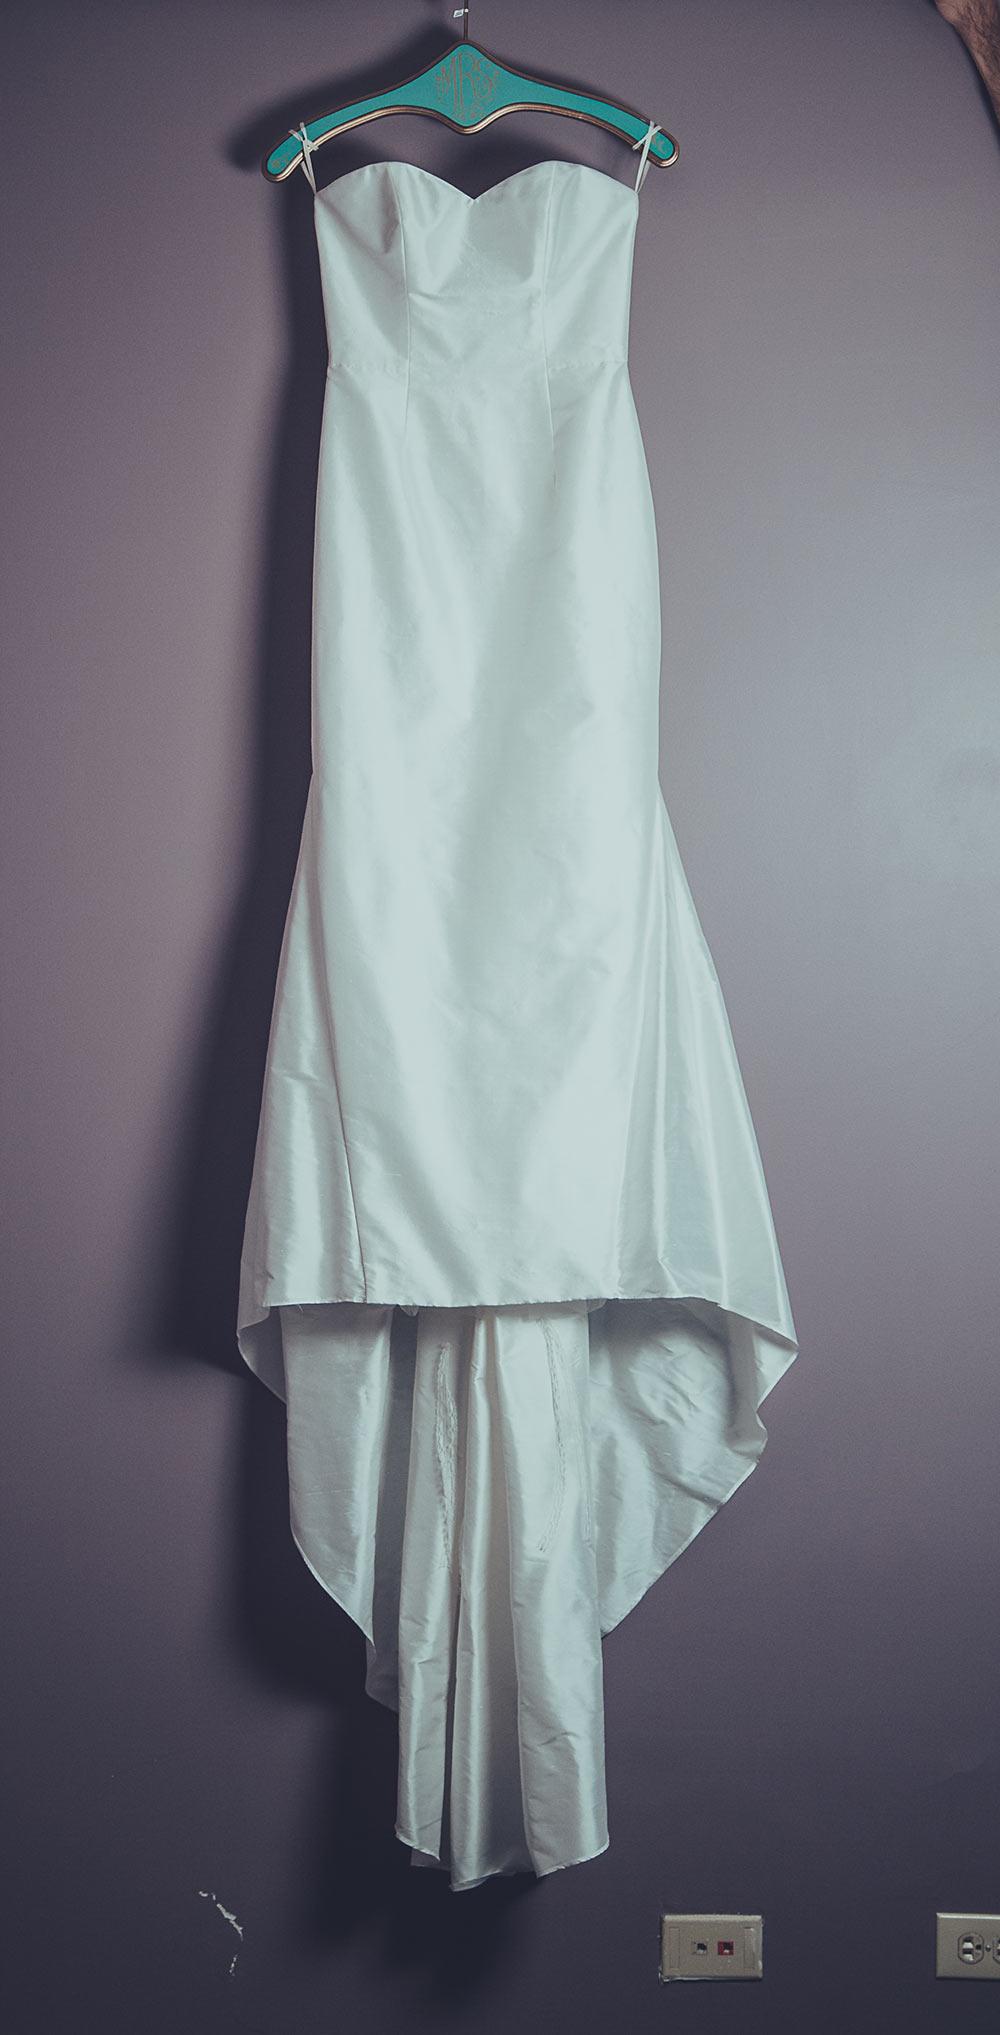 shooting the wedding dress (2)